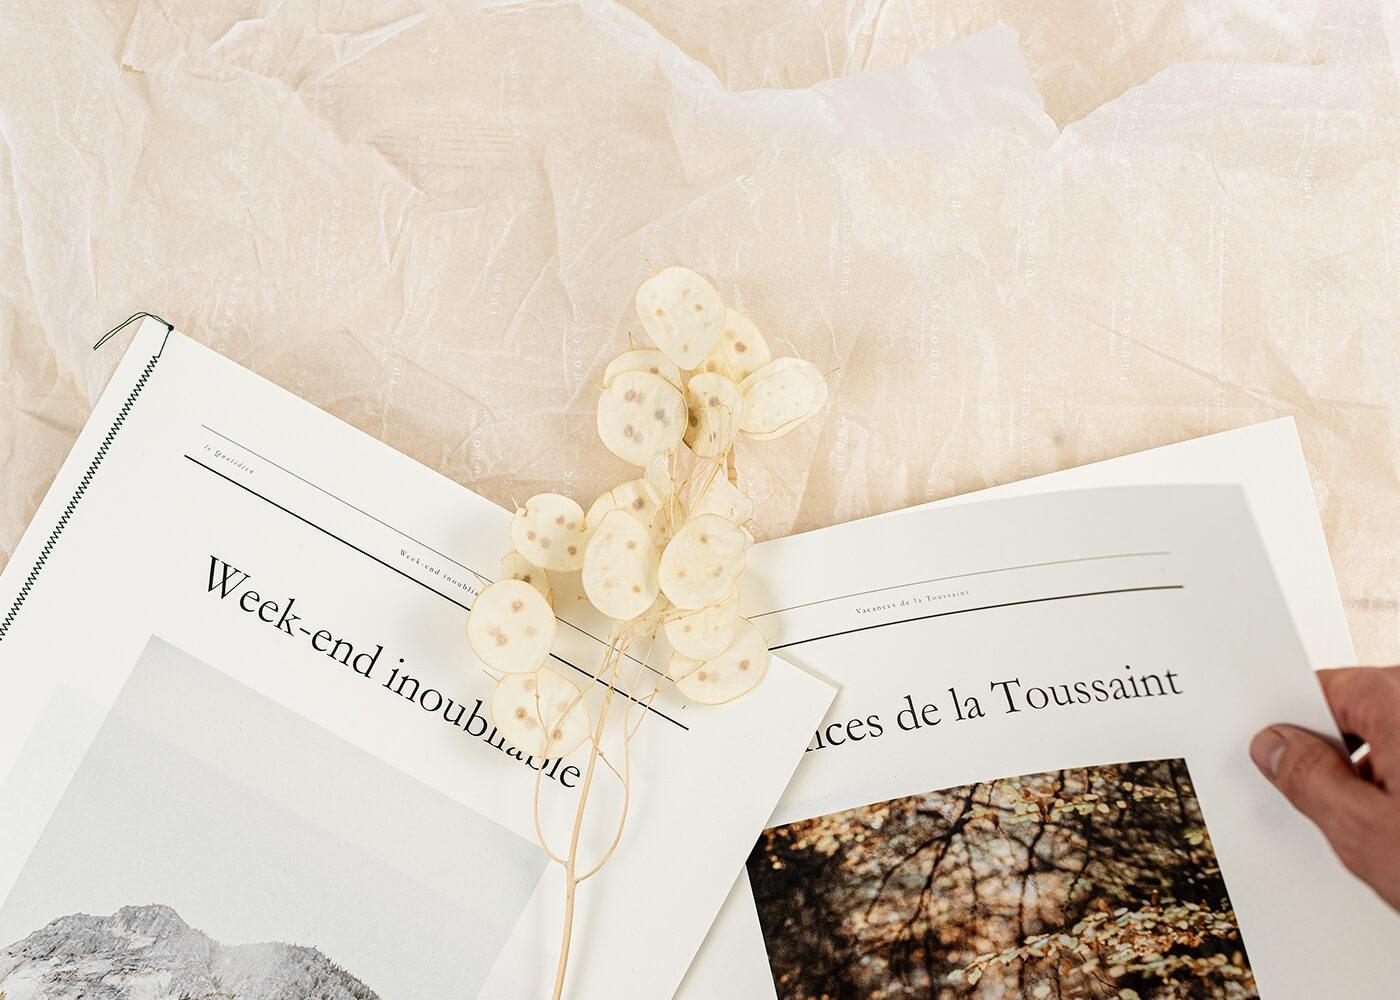 Innocence - Souvenirs - Impression album photo -  Quotidien - Grand format